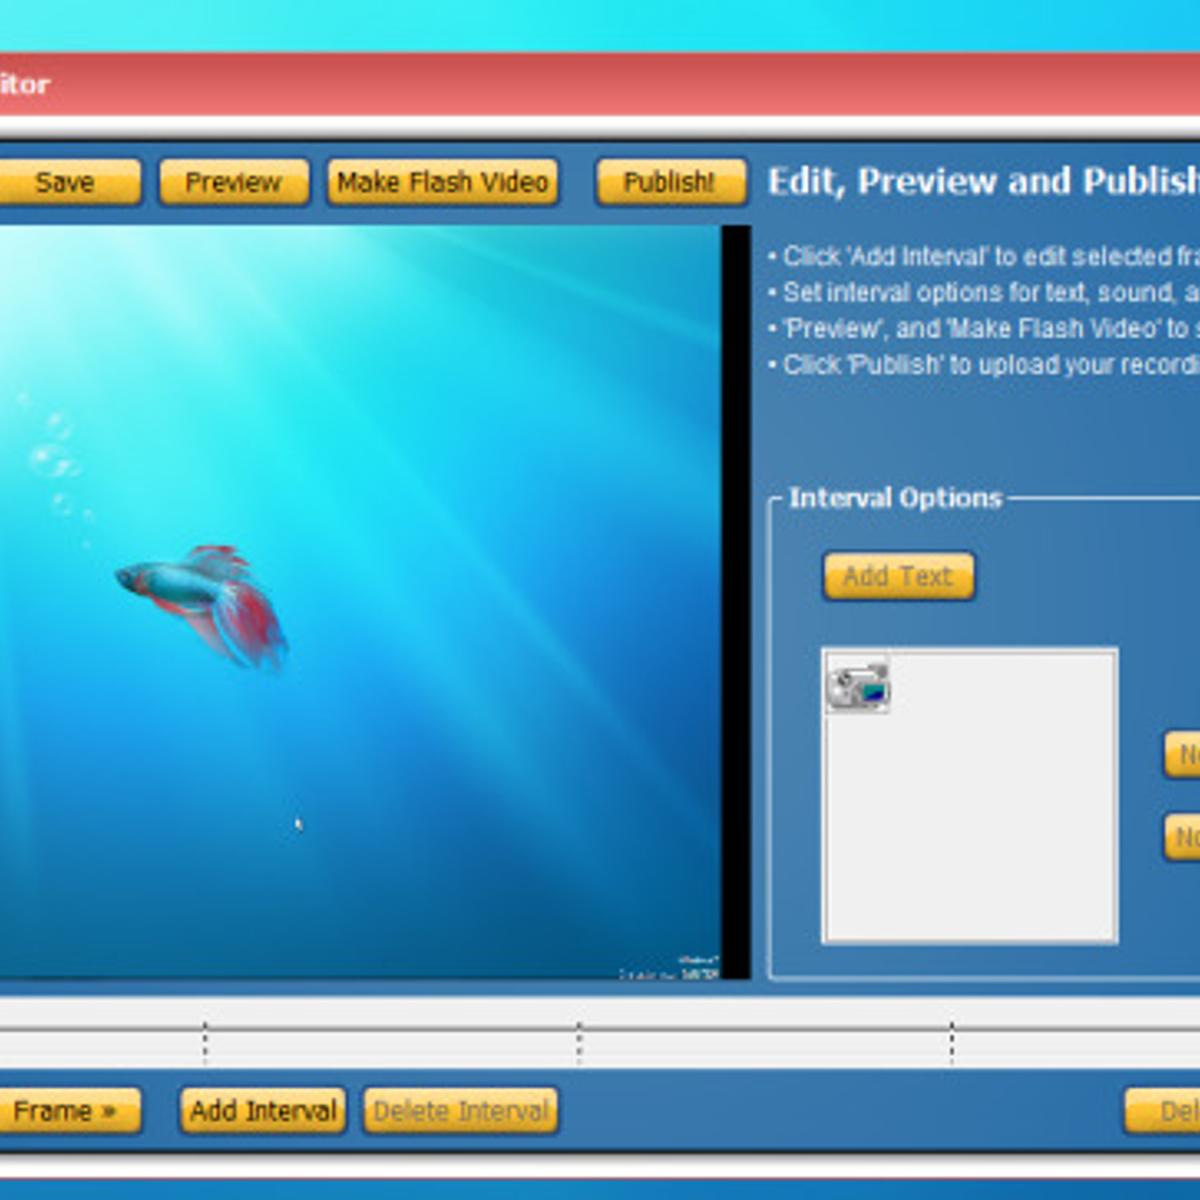 webinaria alternatives and similar software - alternativeto, Presentation templates